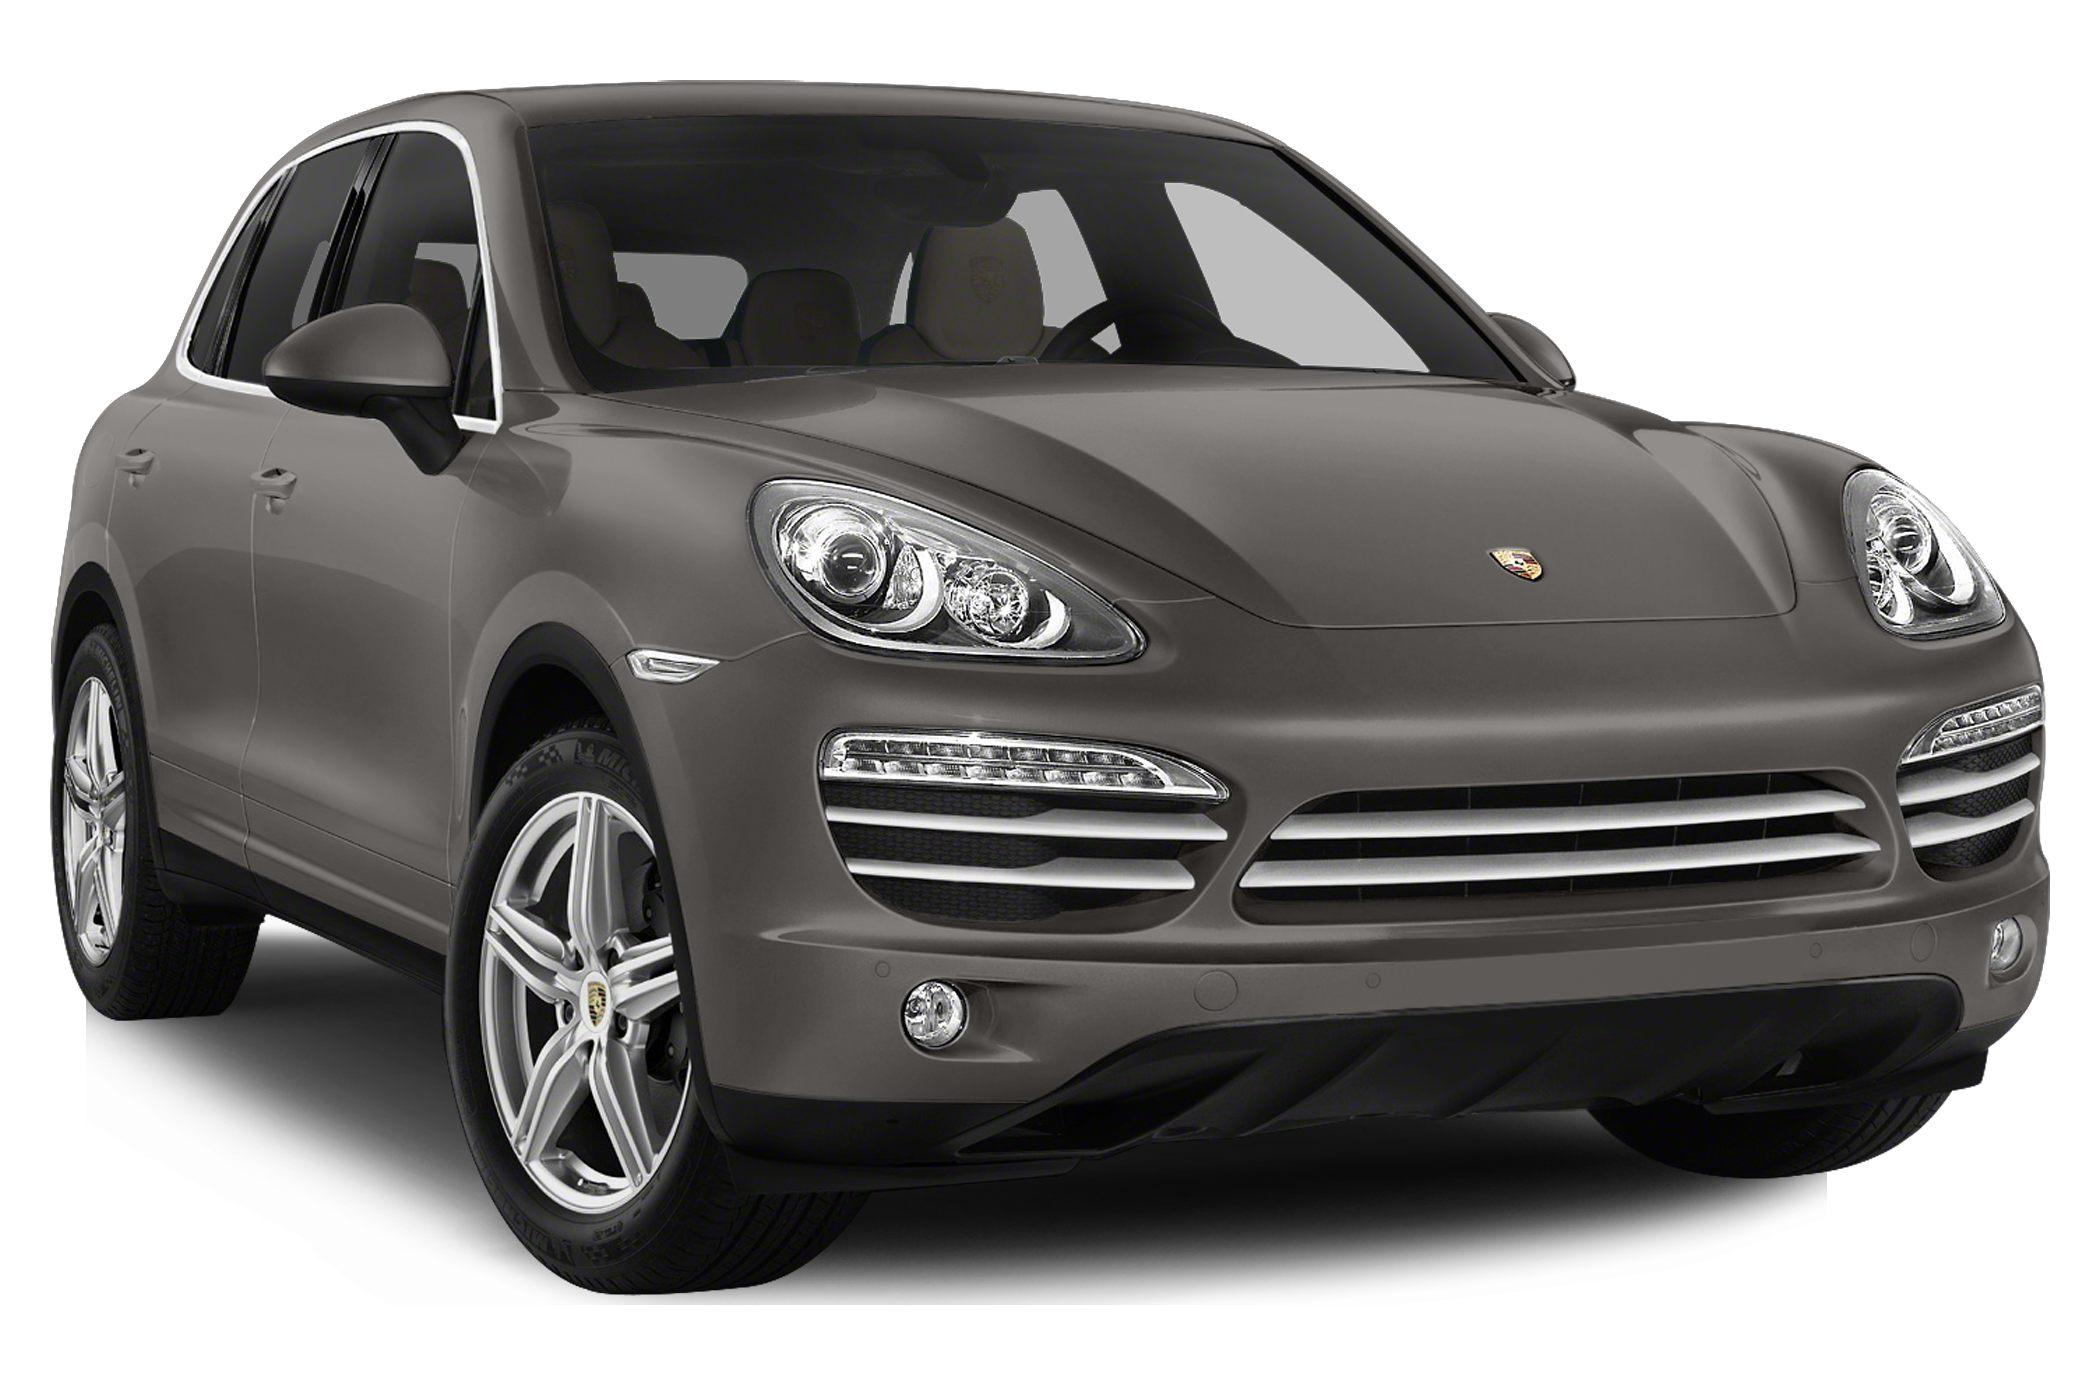 2014 Porsche Cayenne Diesel Platinum Edition 4dr All Wheel Drive Specs And Prices